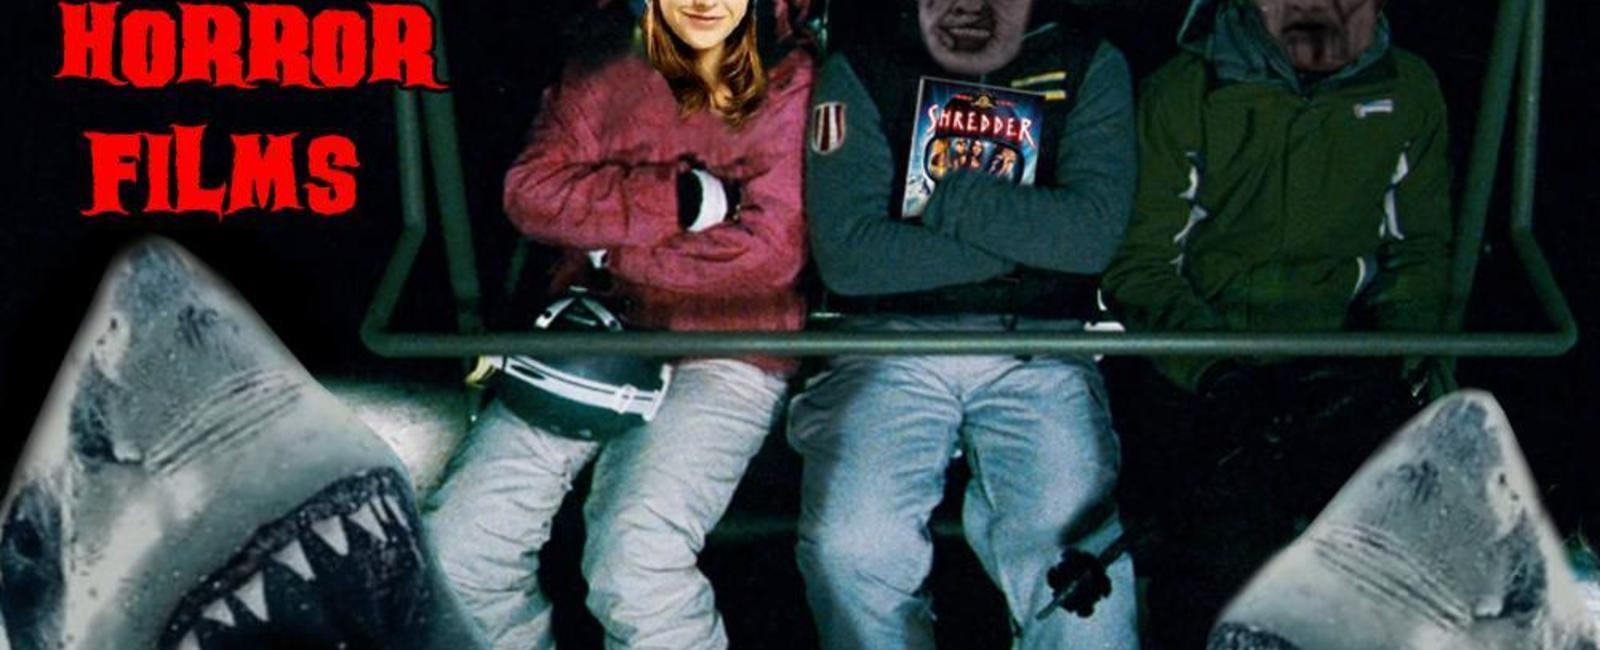 Top 5 Ski Horror Films